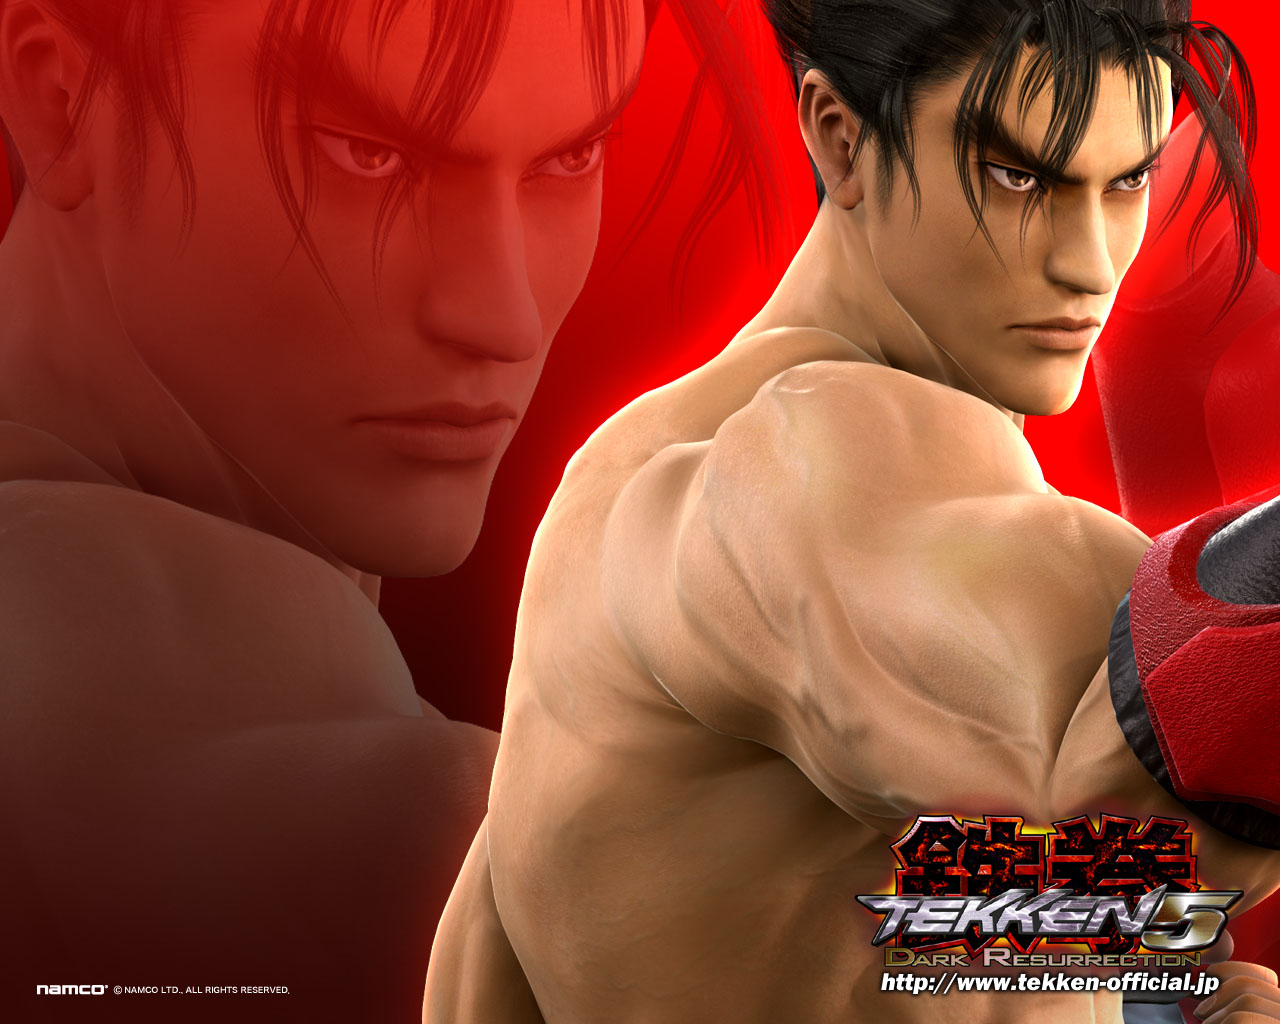 Free Download Jin Kazama Tekken 5 Dark Resurrection 1280x1024 For Your Desktop Mobile Tablet Explore 50 Tekken 5 Wallpaper Tekken Tag 2 Wallpapers Tekken